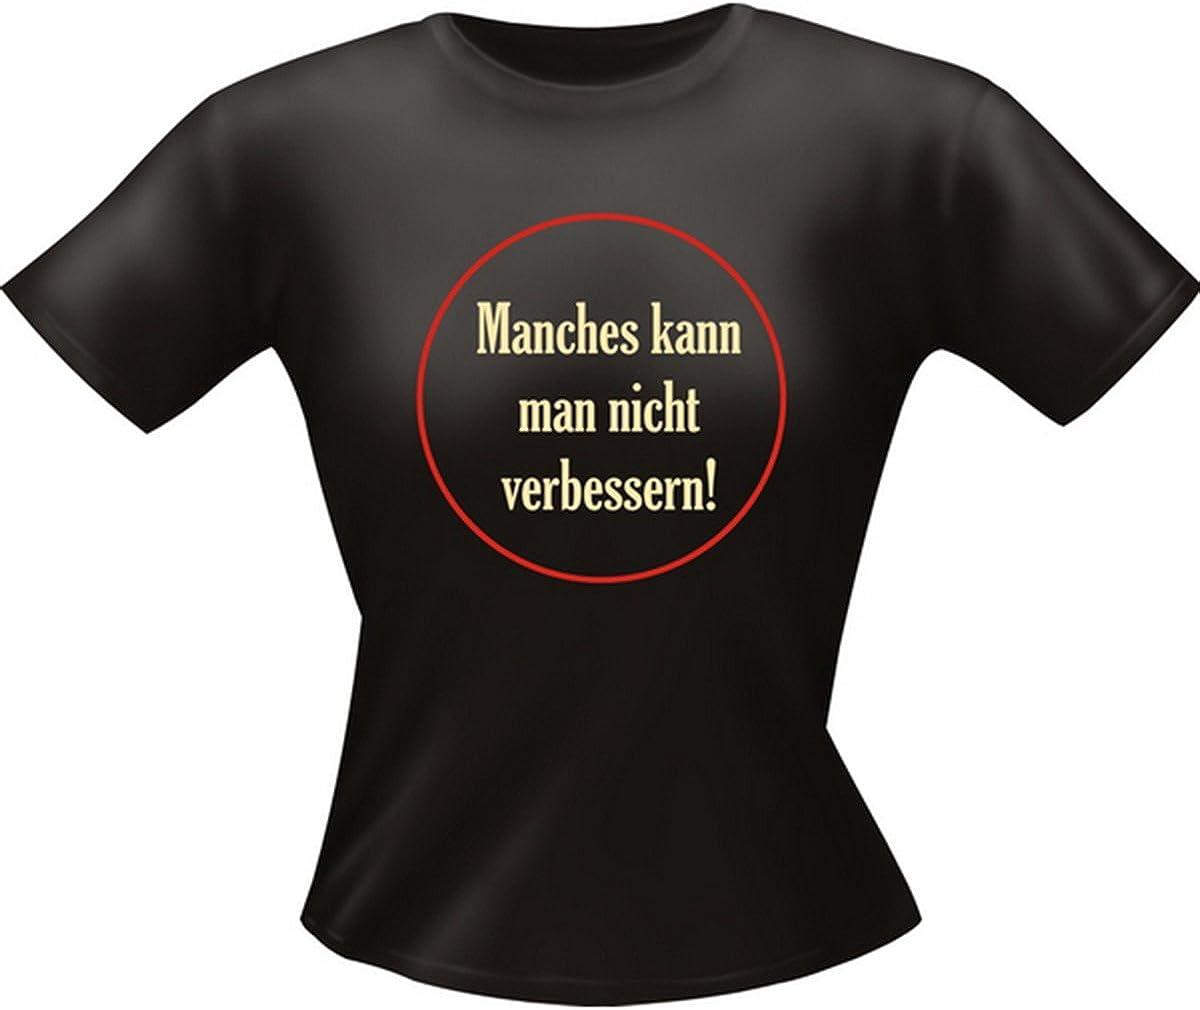 /Camiseta para Hombre Unbekannt/